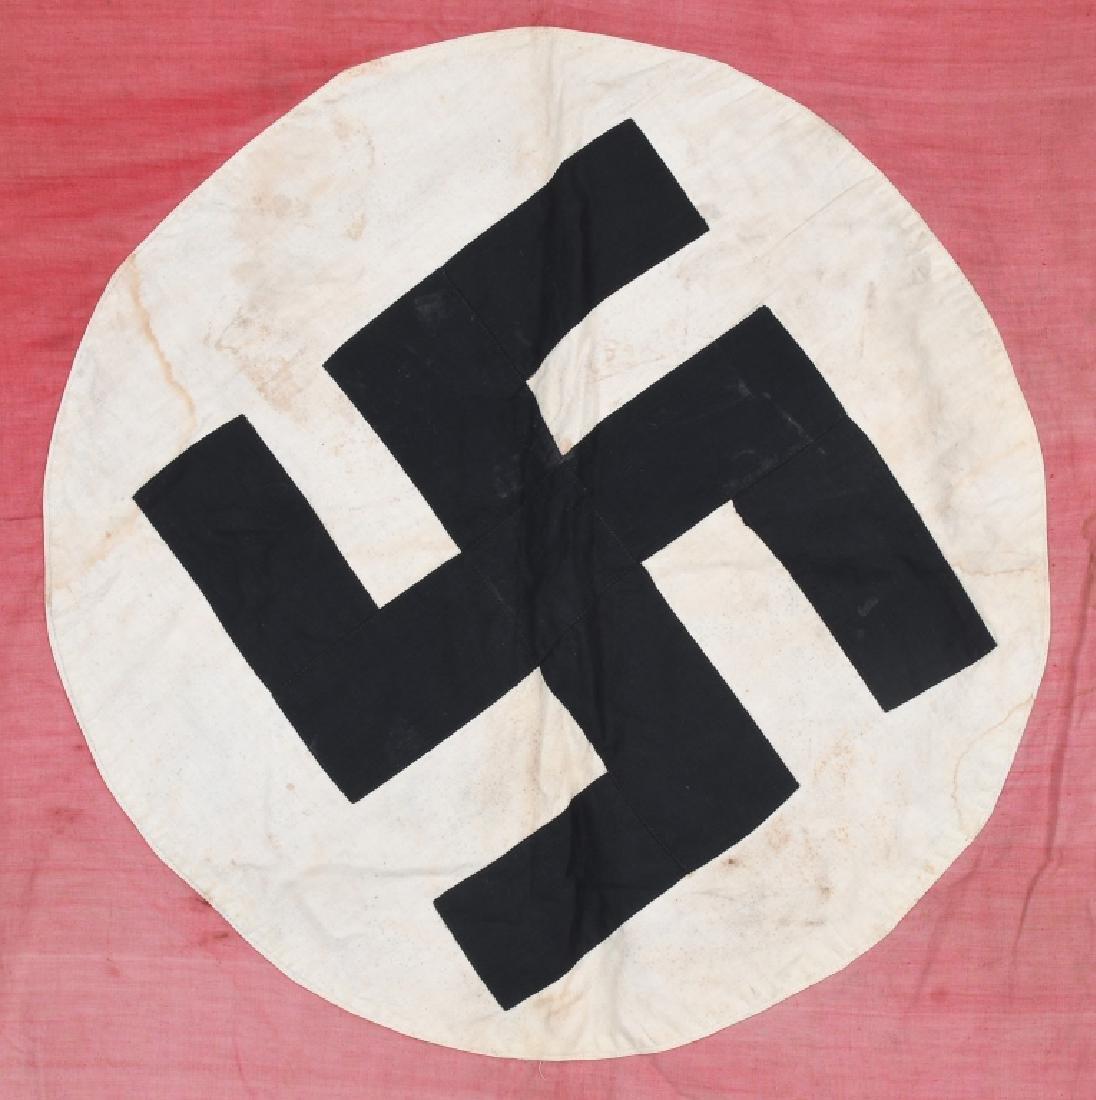 WWII NAZI GERMAN FLAG -1945 CAPTURED & GI SIGNED - 8